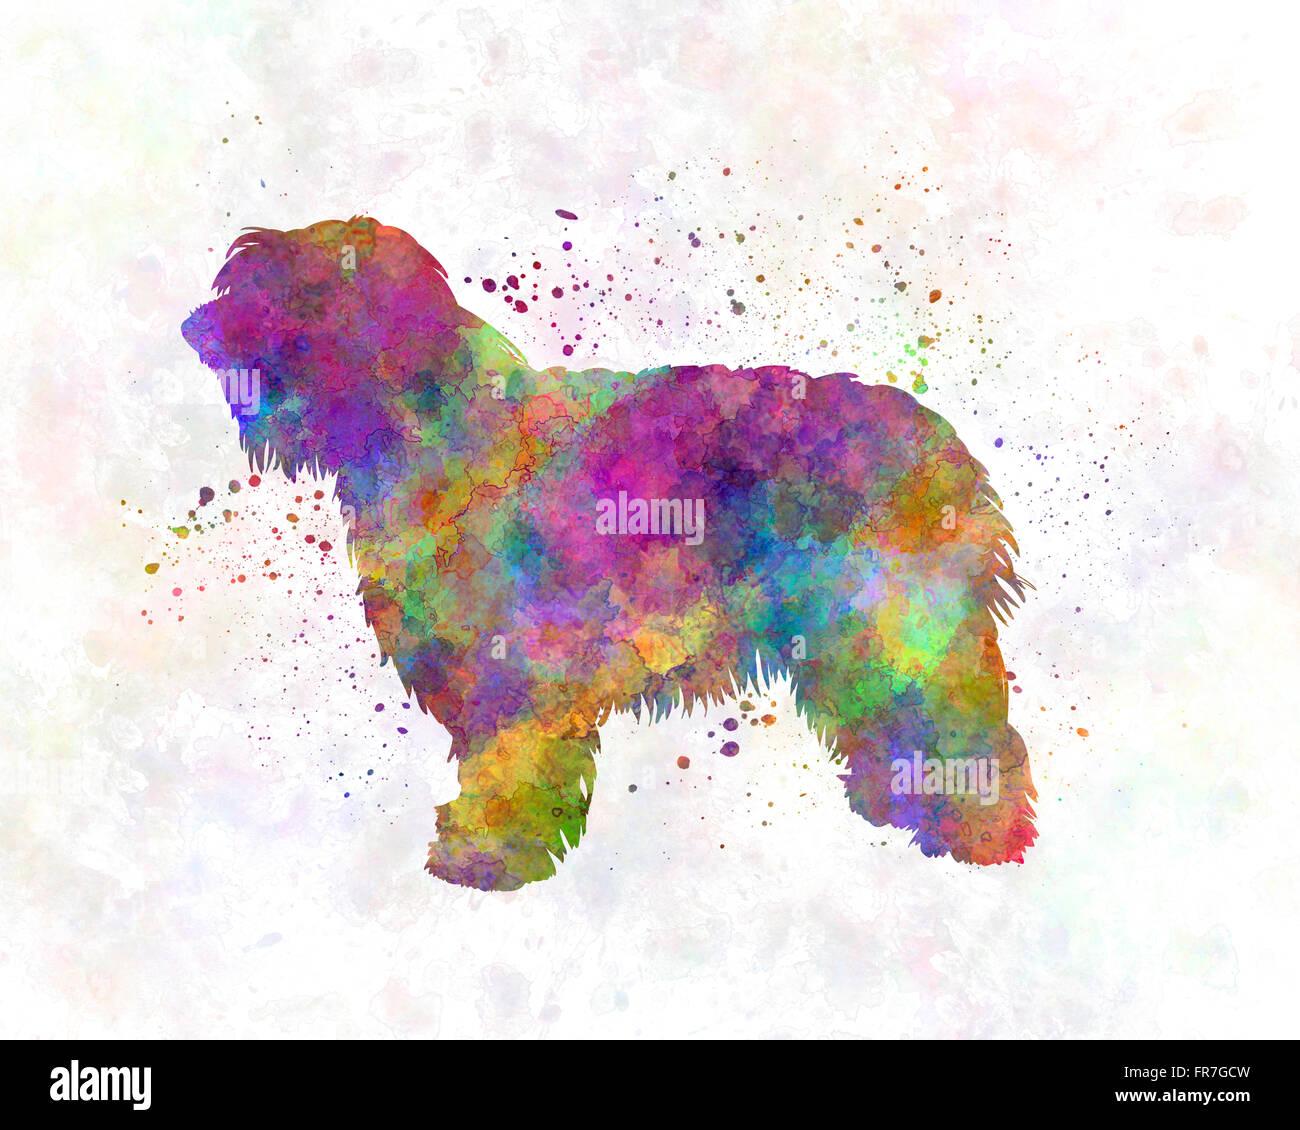 Catalonian Sheepdog in watercolor - Stock Image